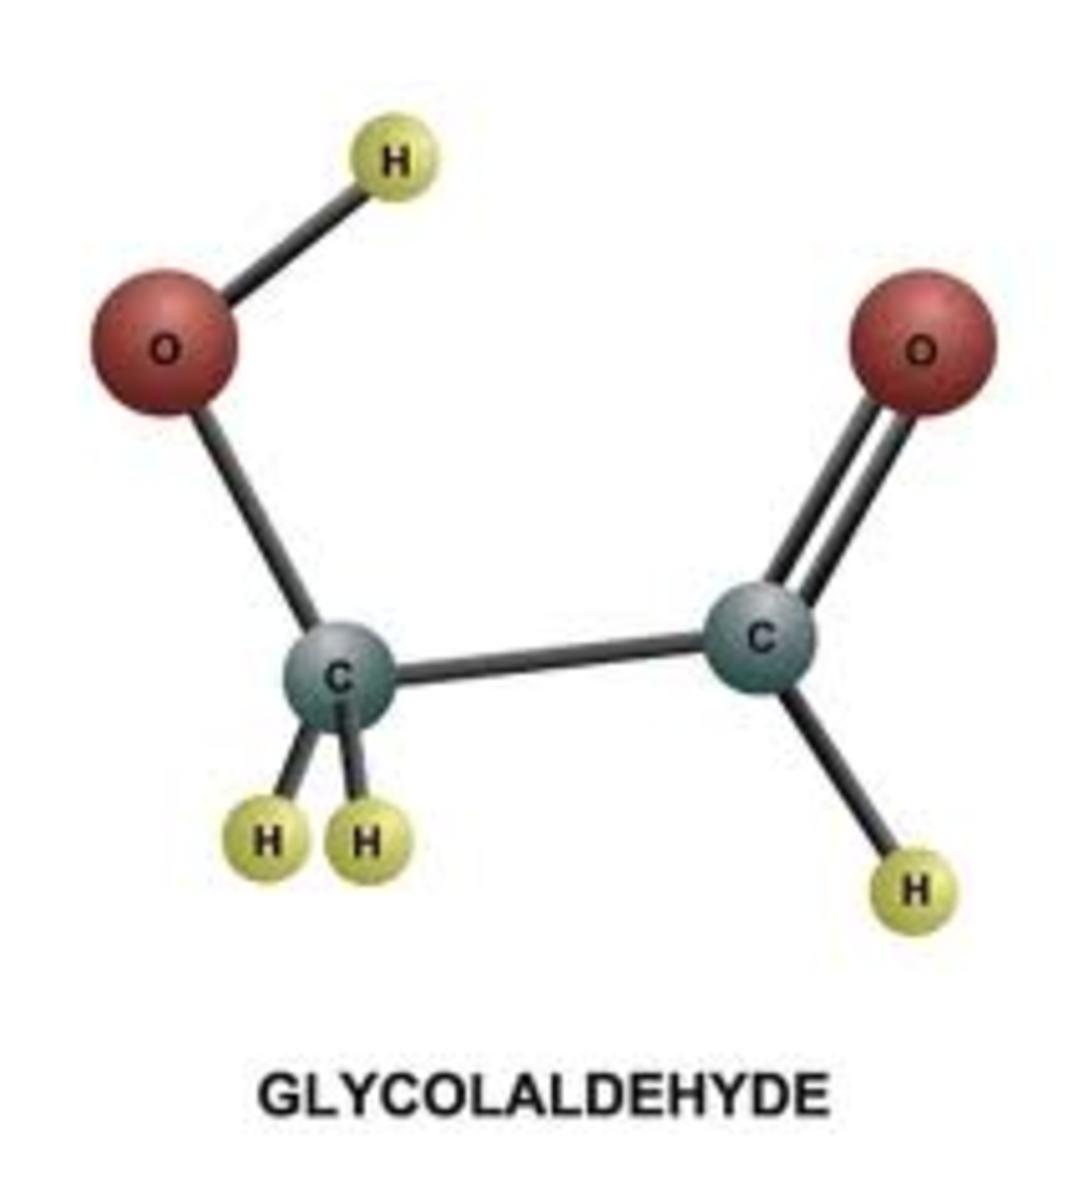 Sugar molecule linked to the origin of life